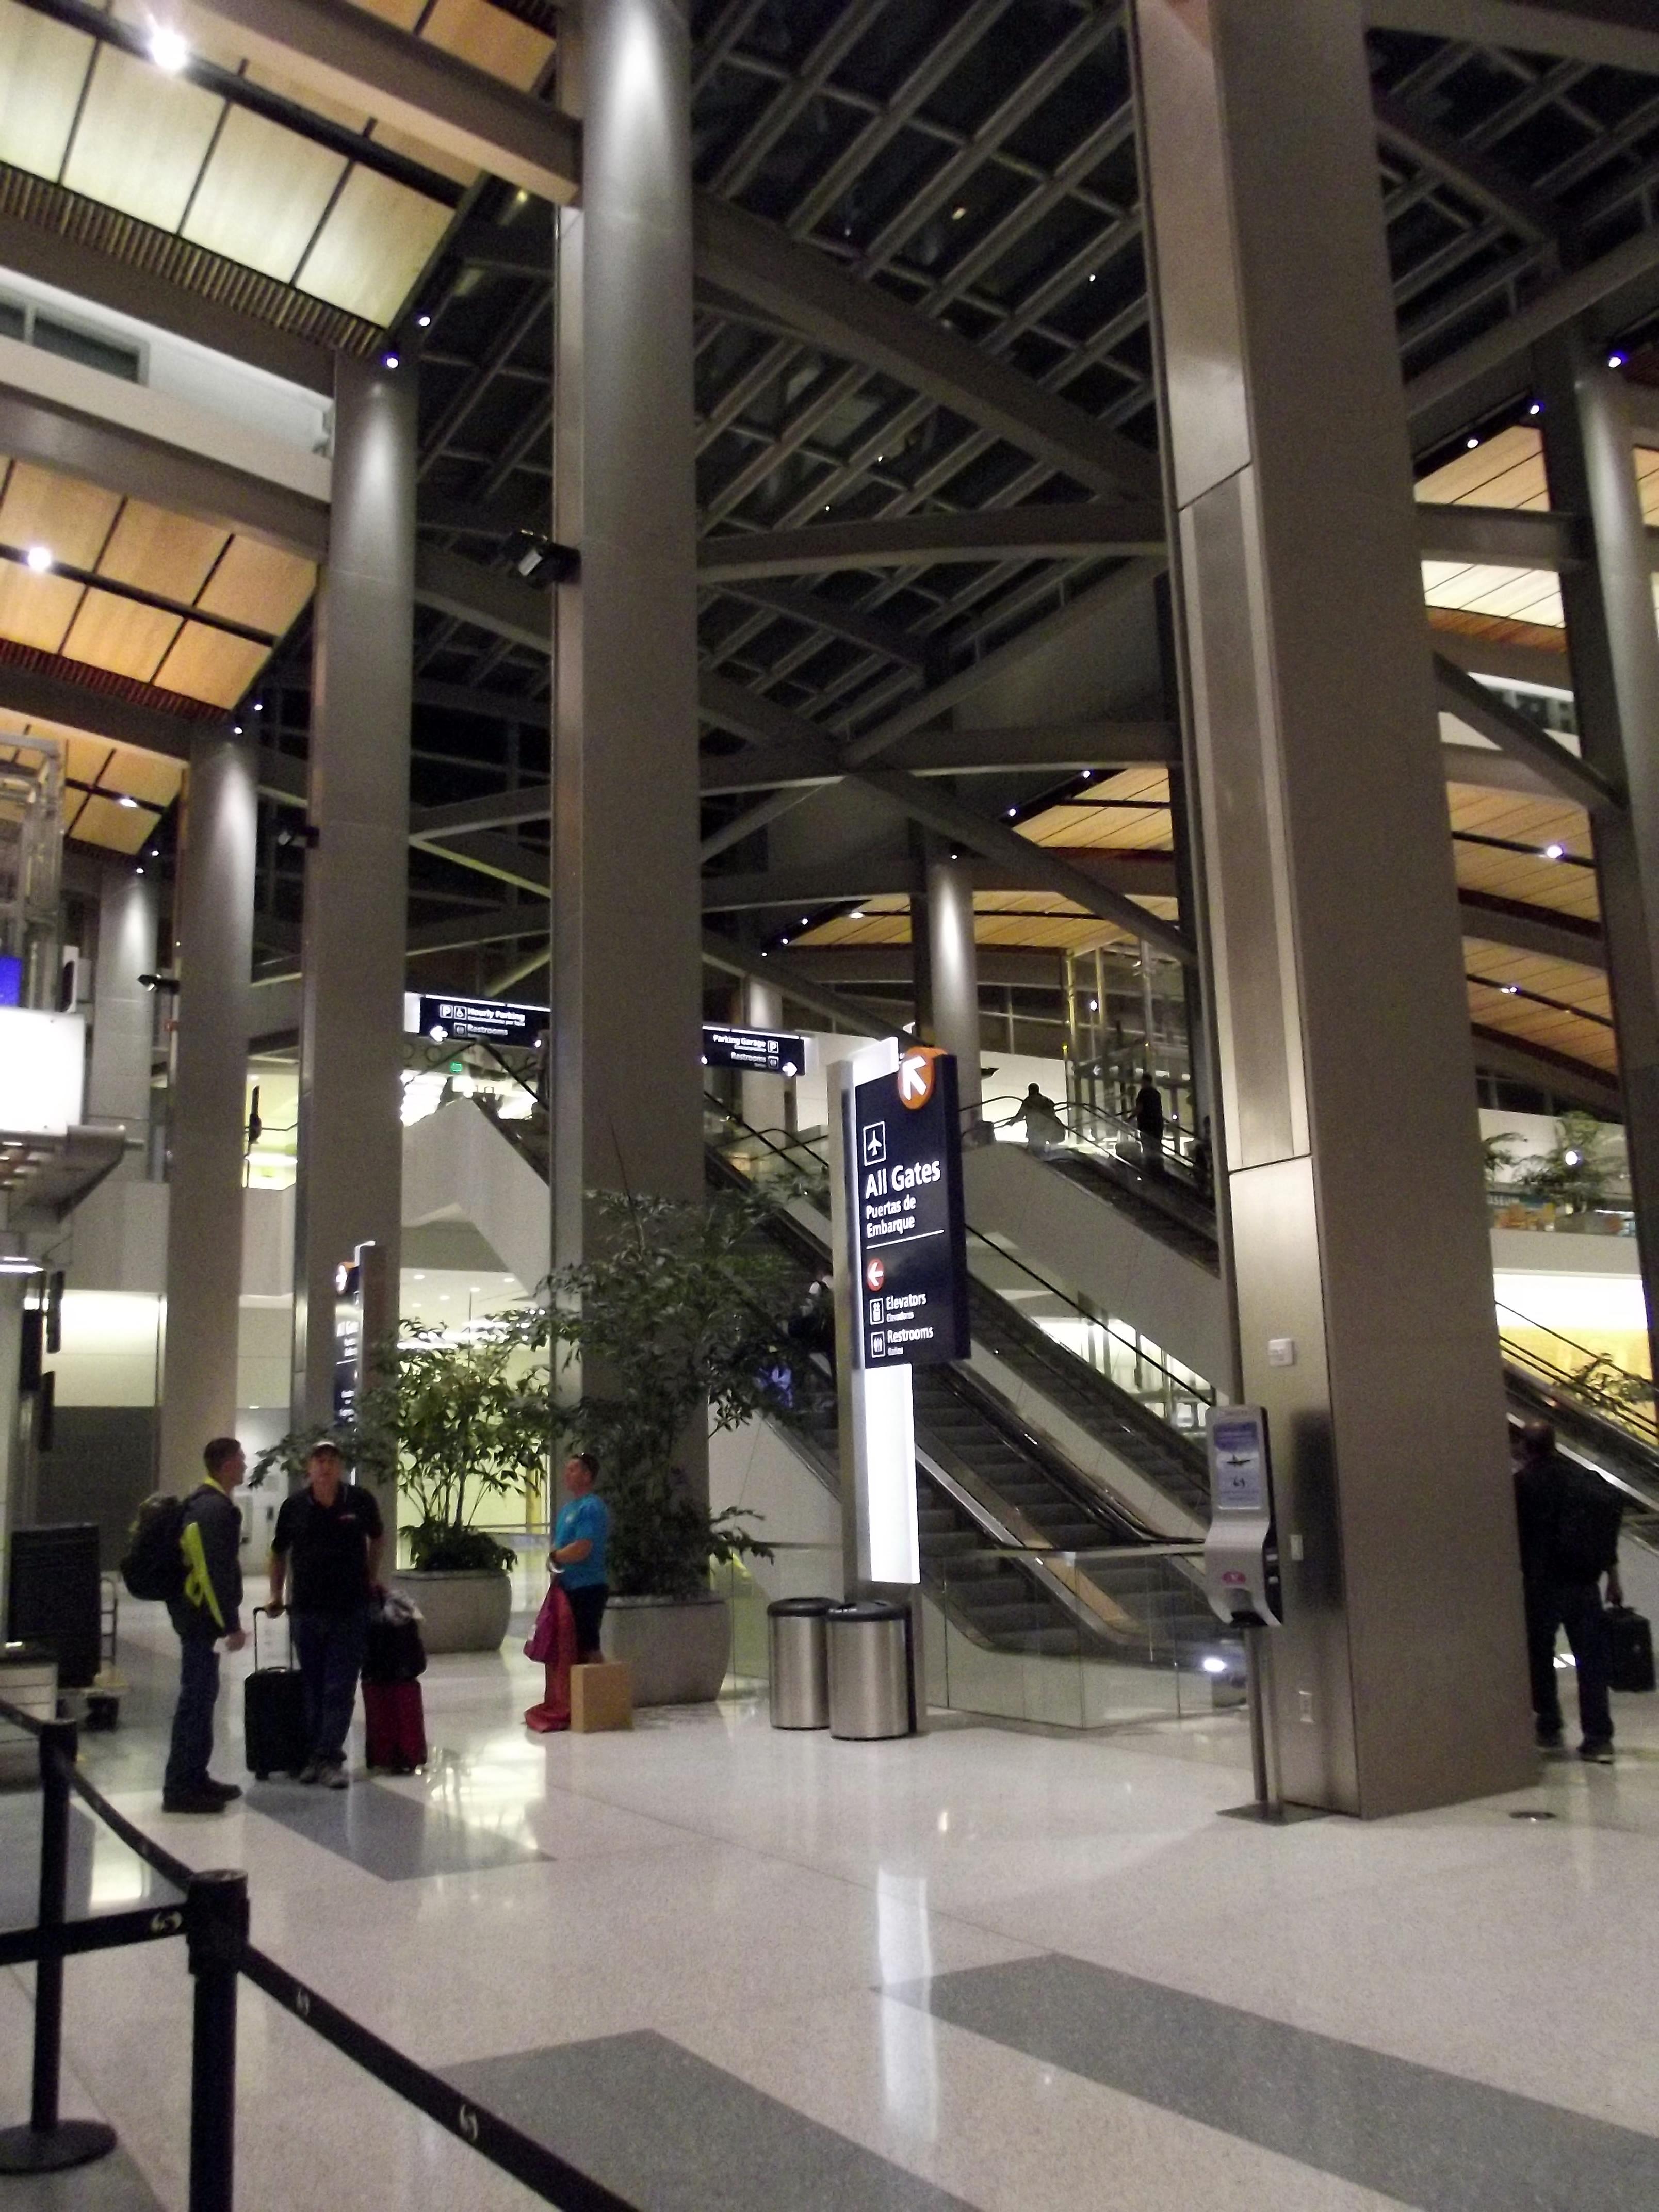 Depiction of Aeropuerto Internacional de Sacramento